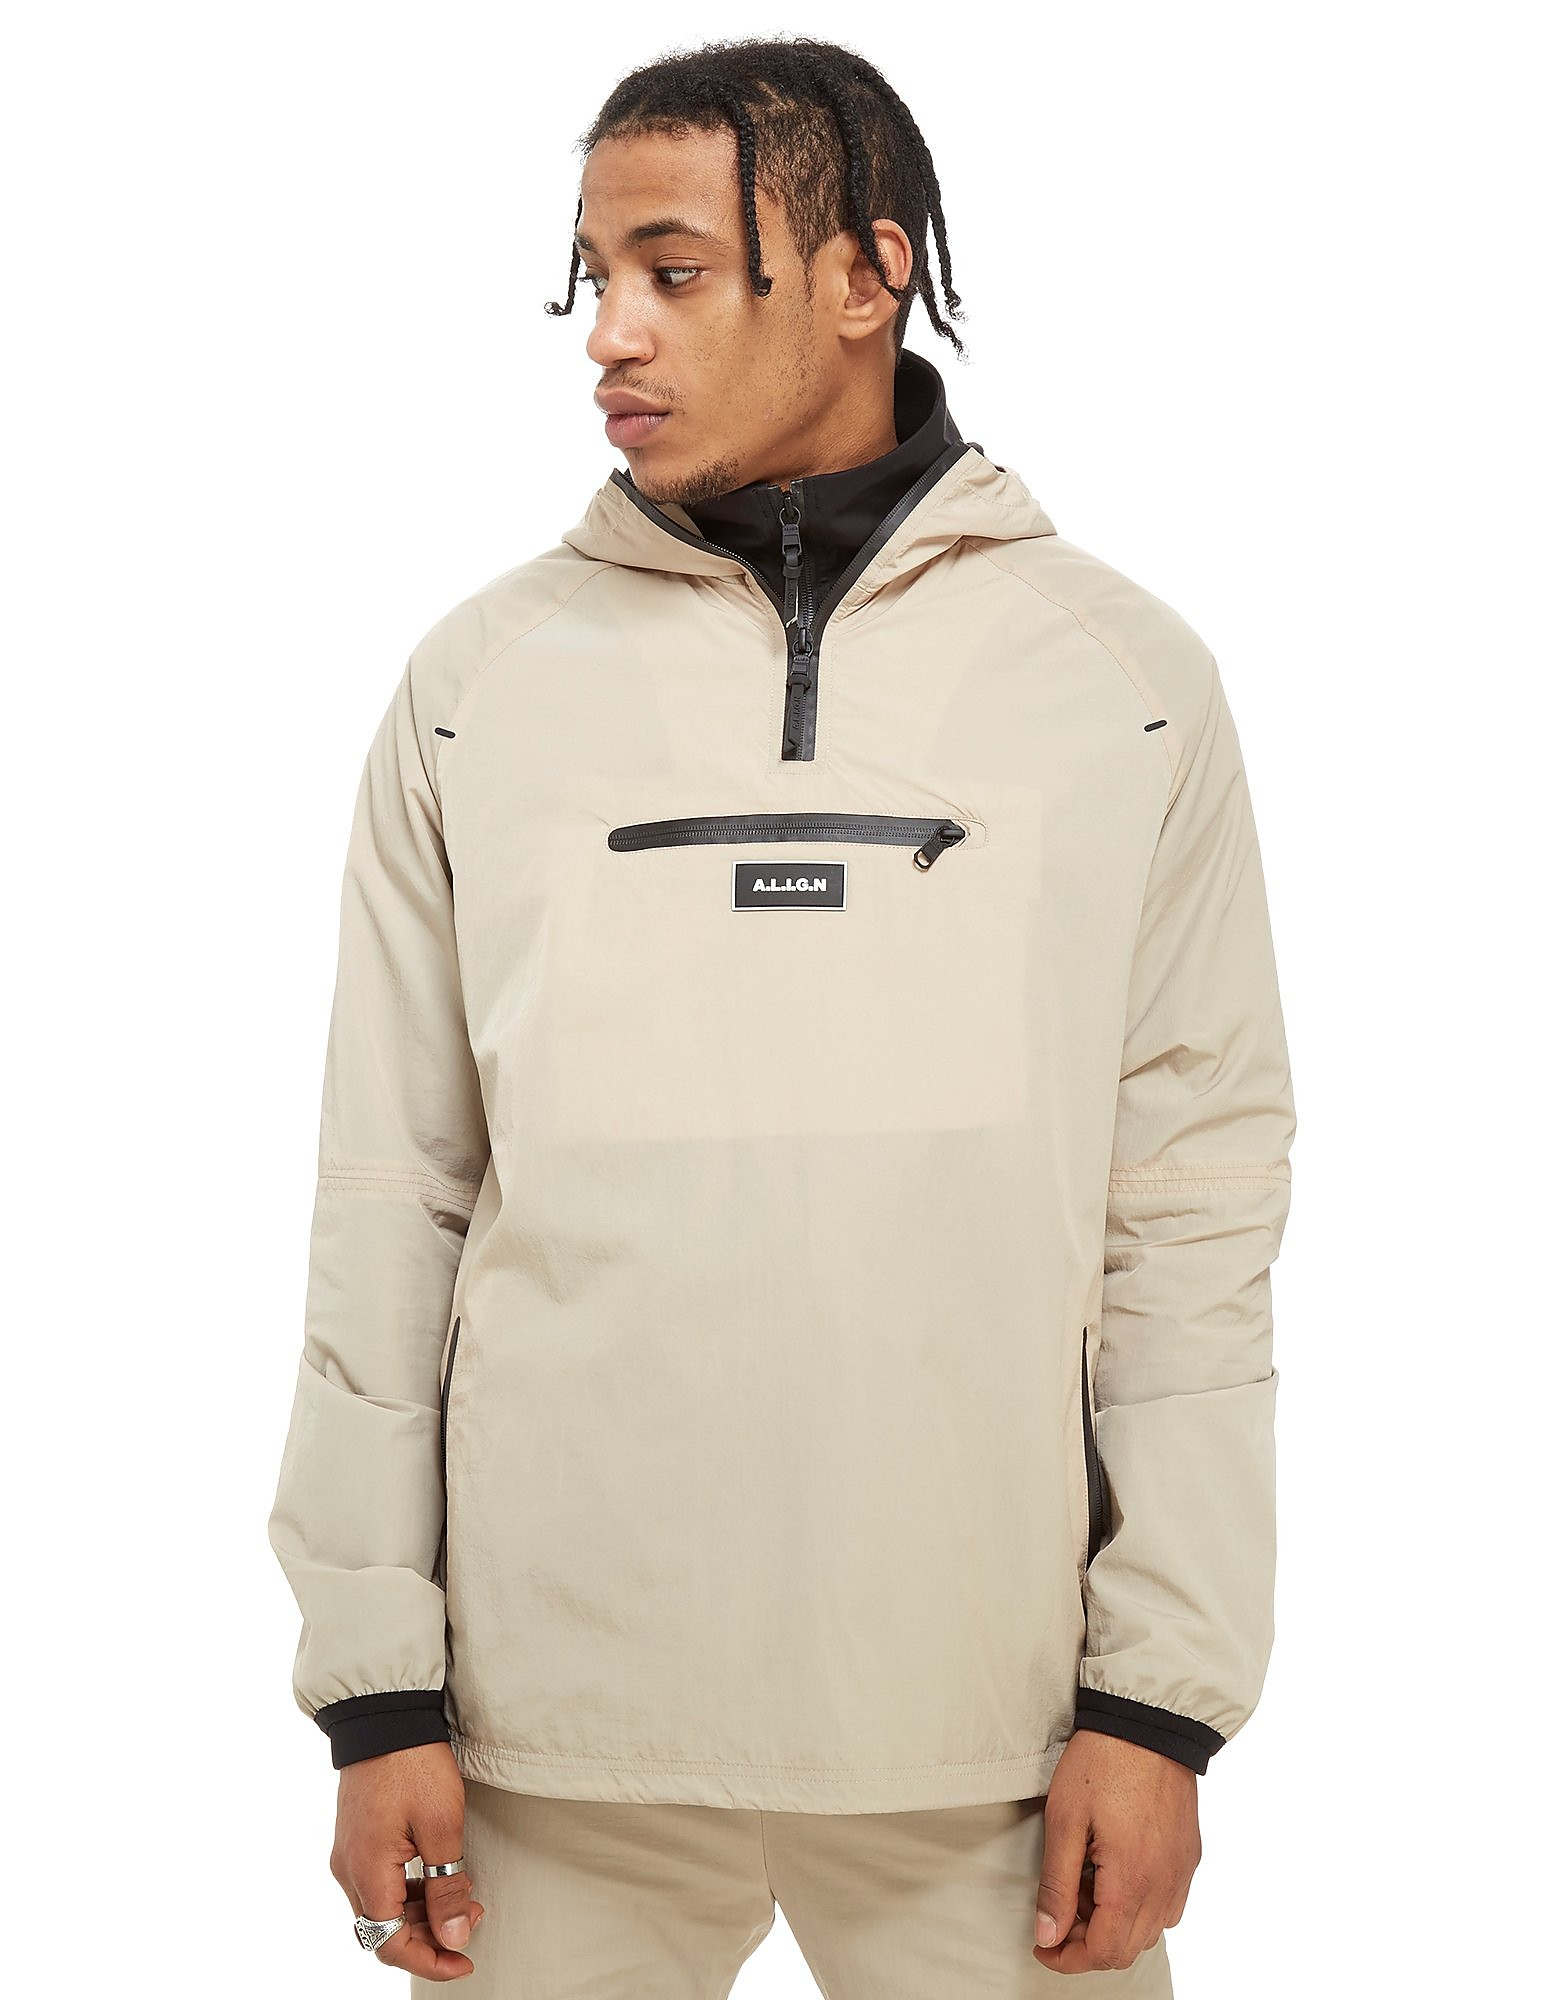 Align Vultee Jacket